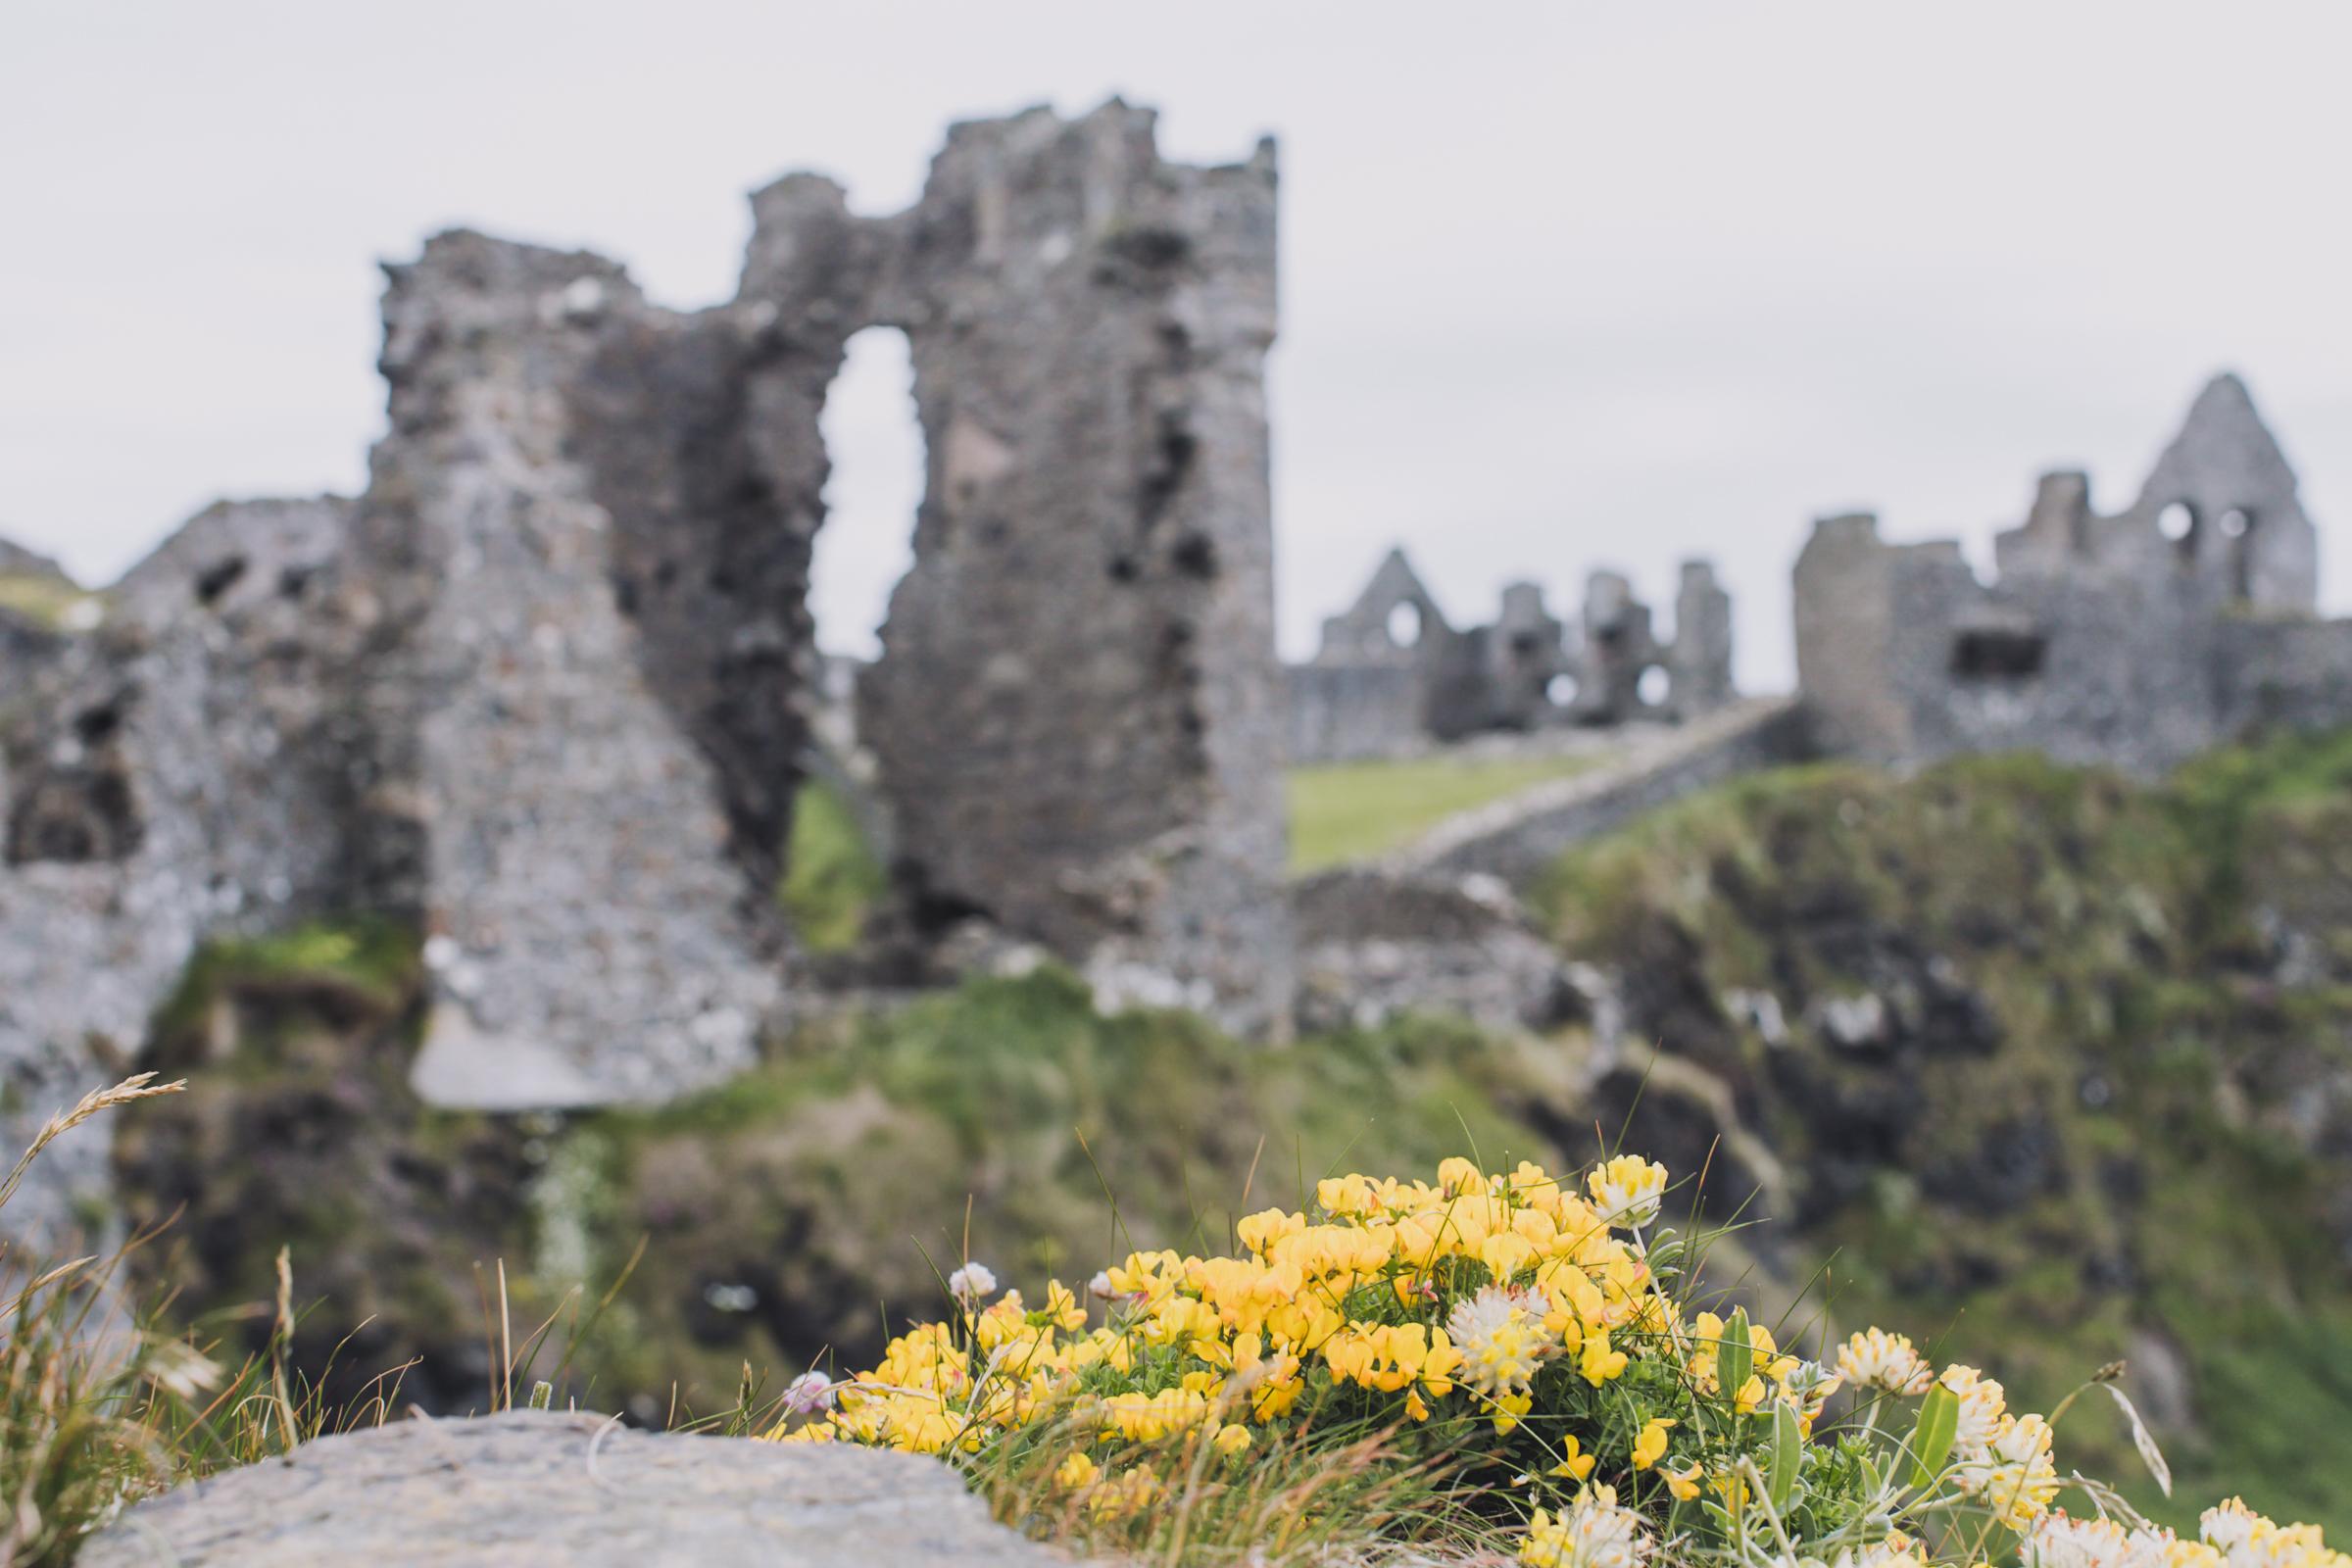 20150619-099-Ireland_Travel_Editorial.jpg